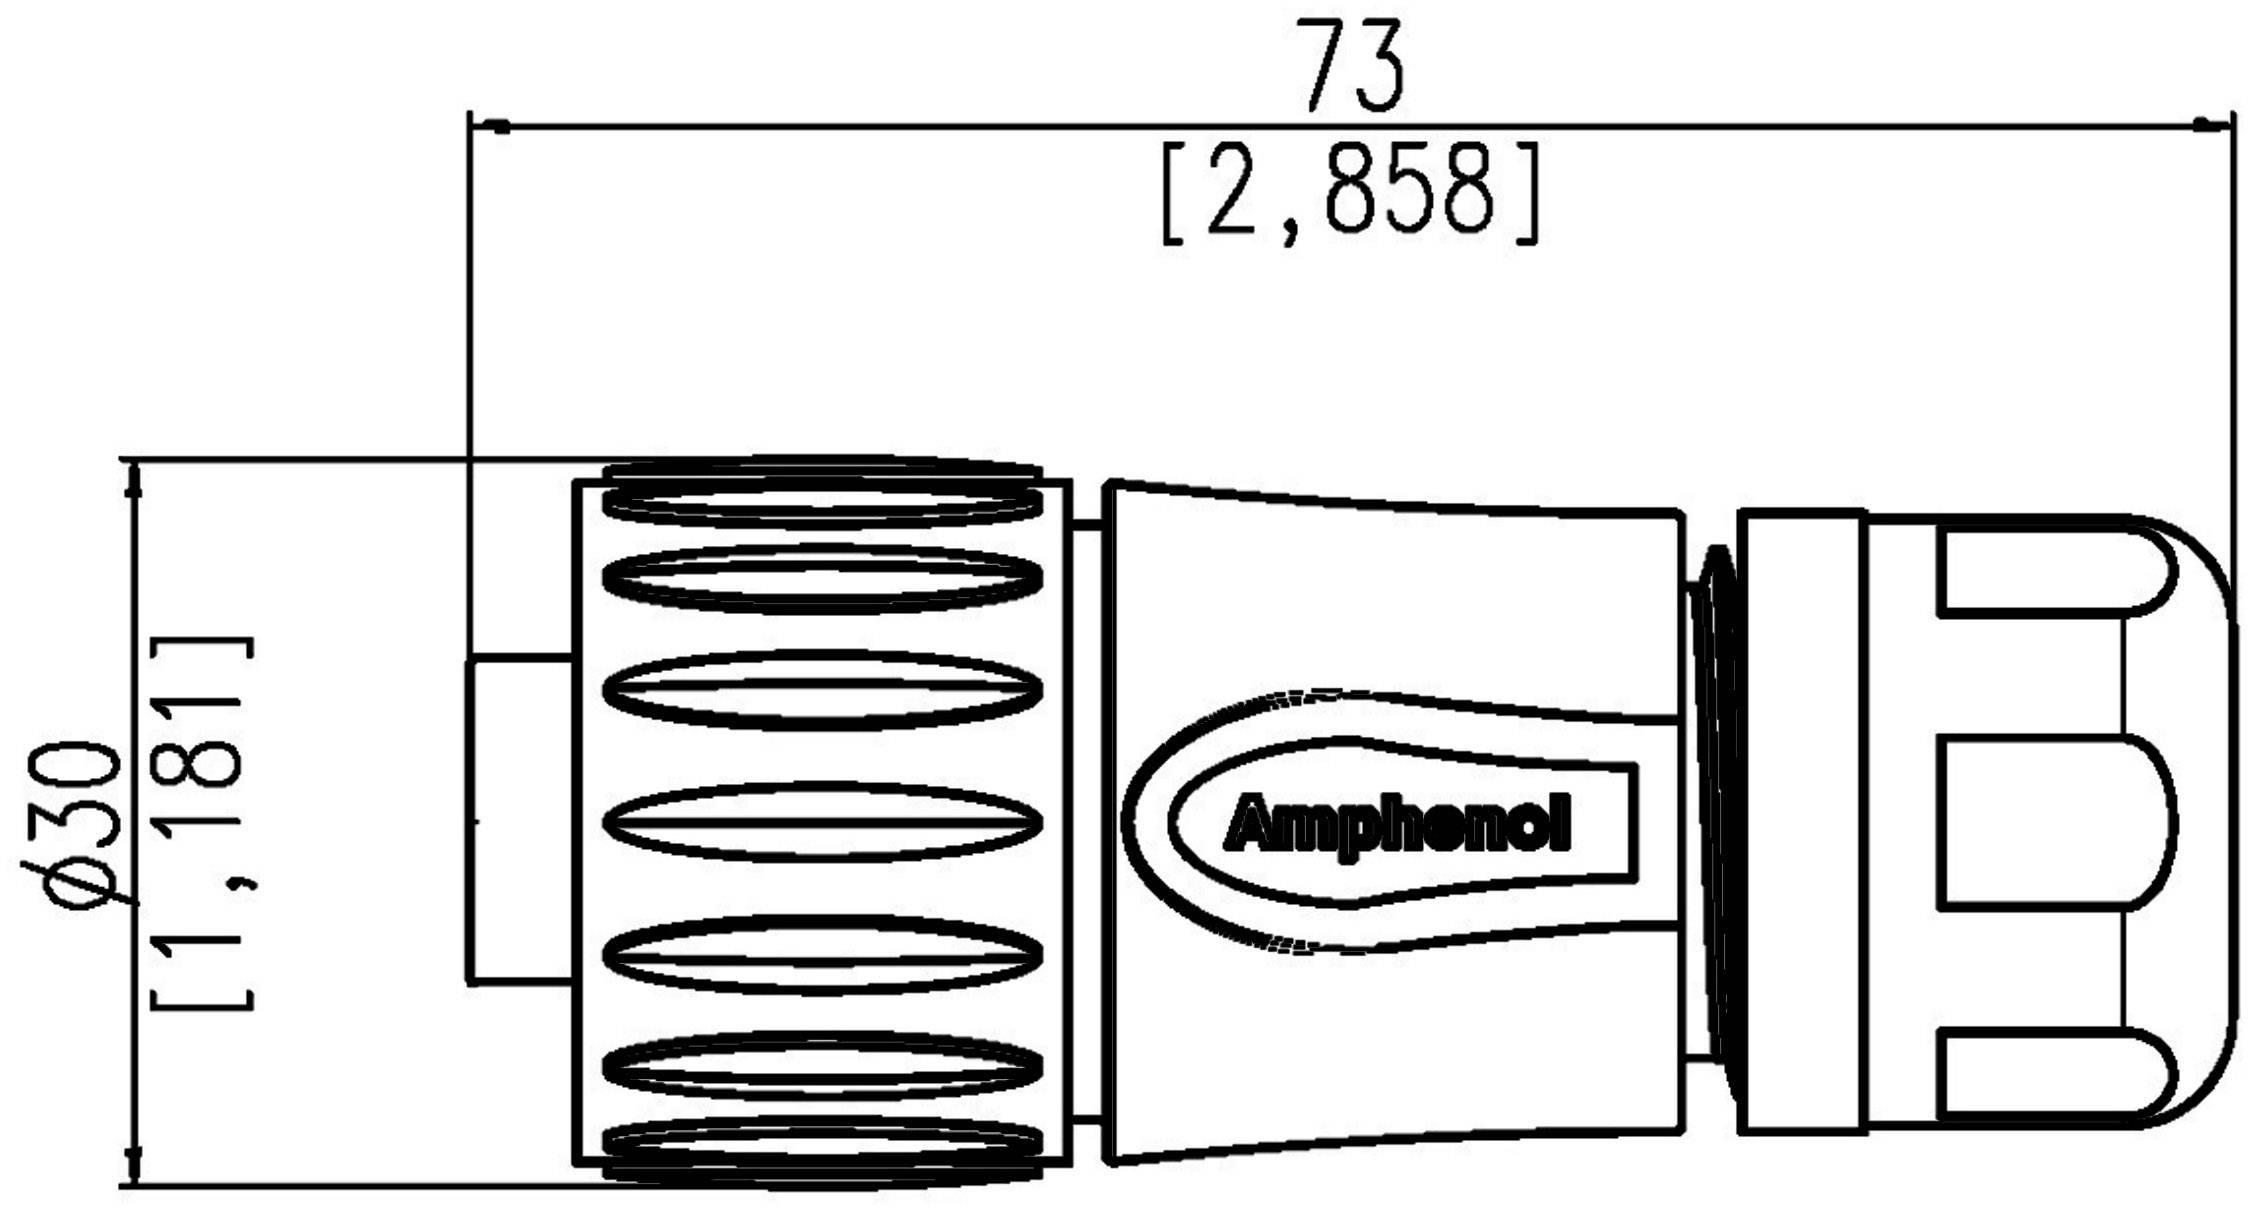 Amphenol C016 10D006 010 12 IP67 (v zablokovanom stave), polyamid 6.6, pólů + PE, 1 ks